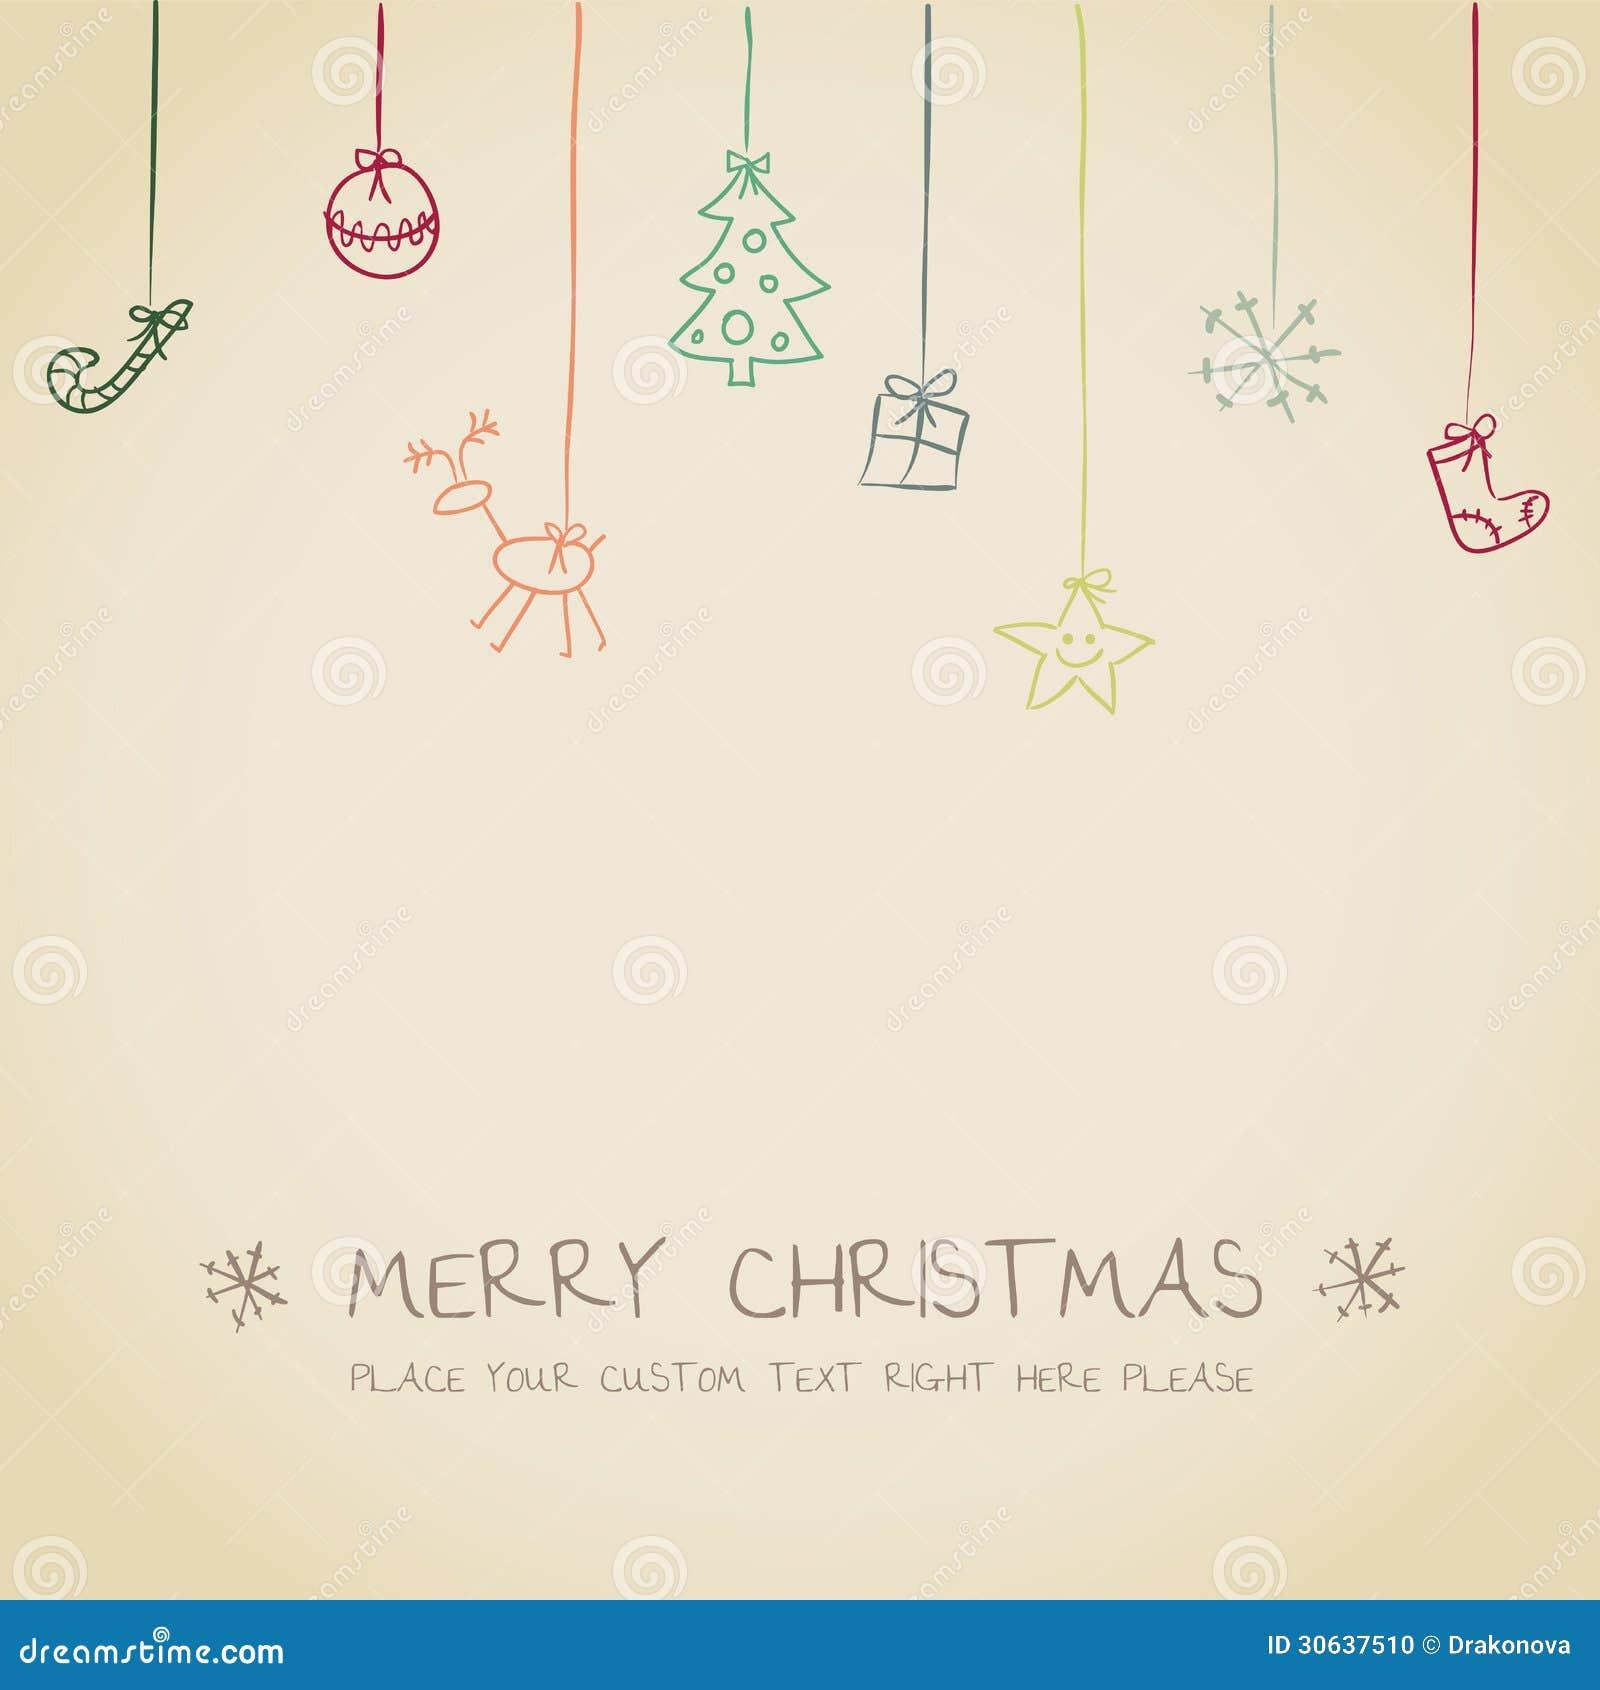 Christmas Invitation Card Stock Photo - Image: 30637510